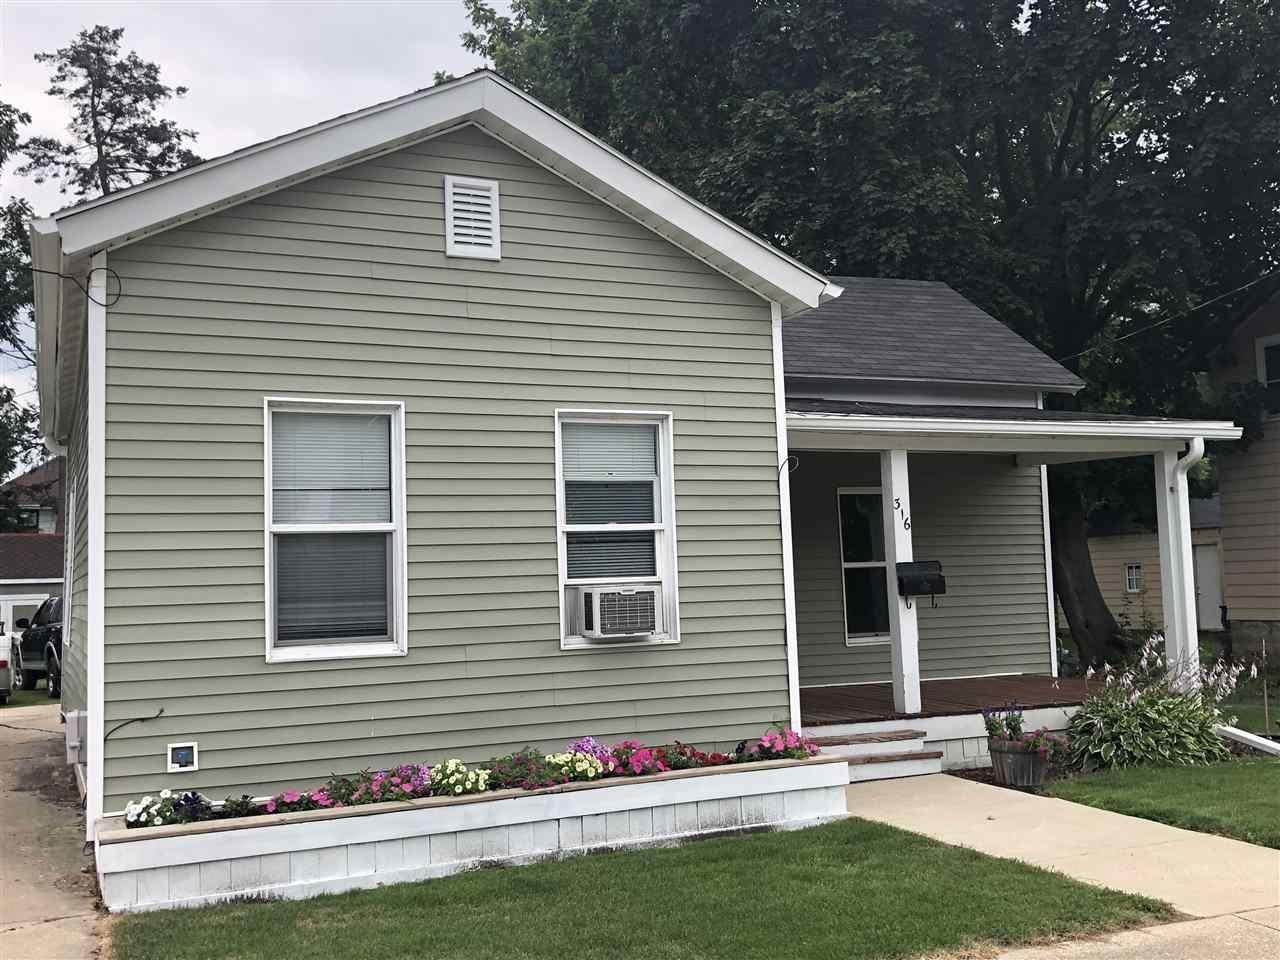 316 N Pearl St, Janesville, WI 53545 - #: 1914907